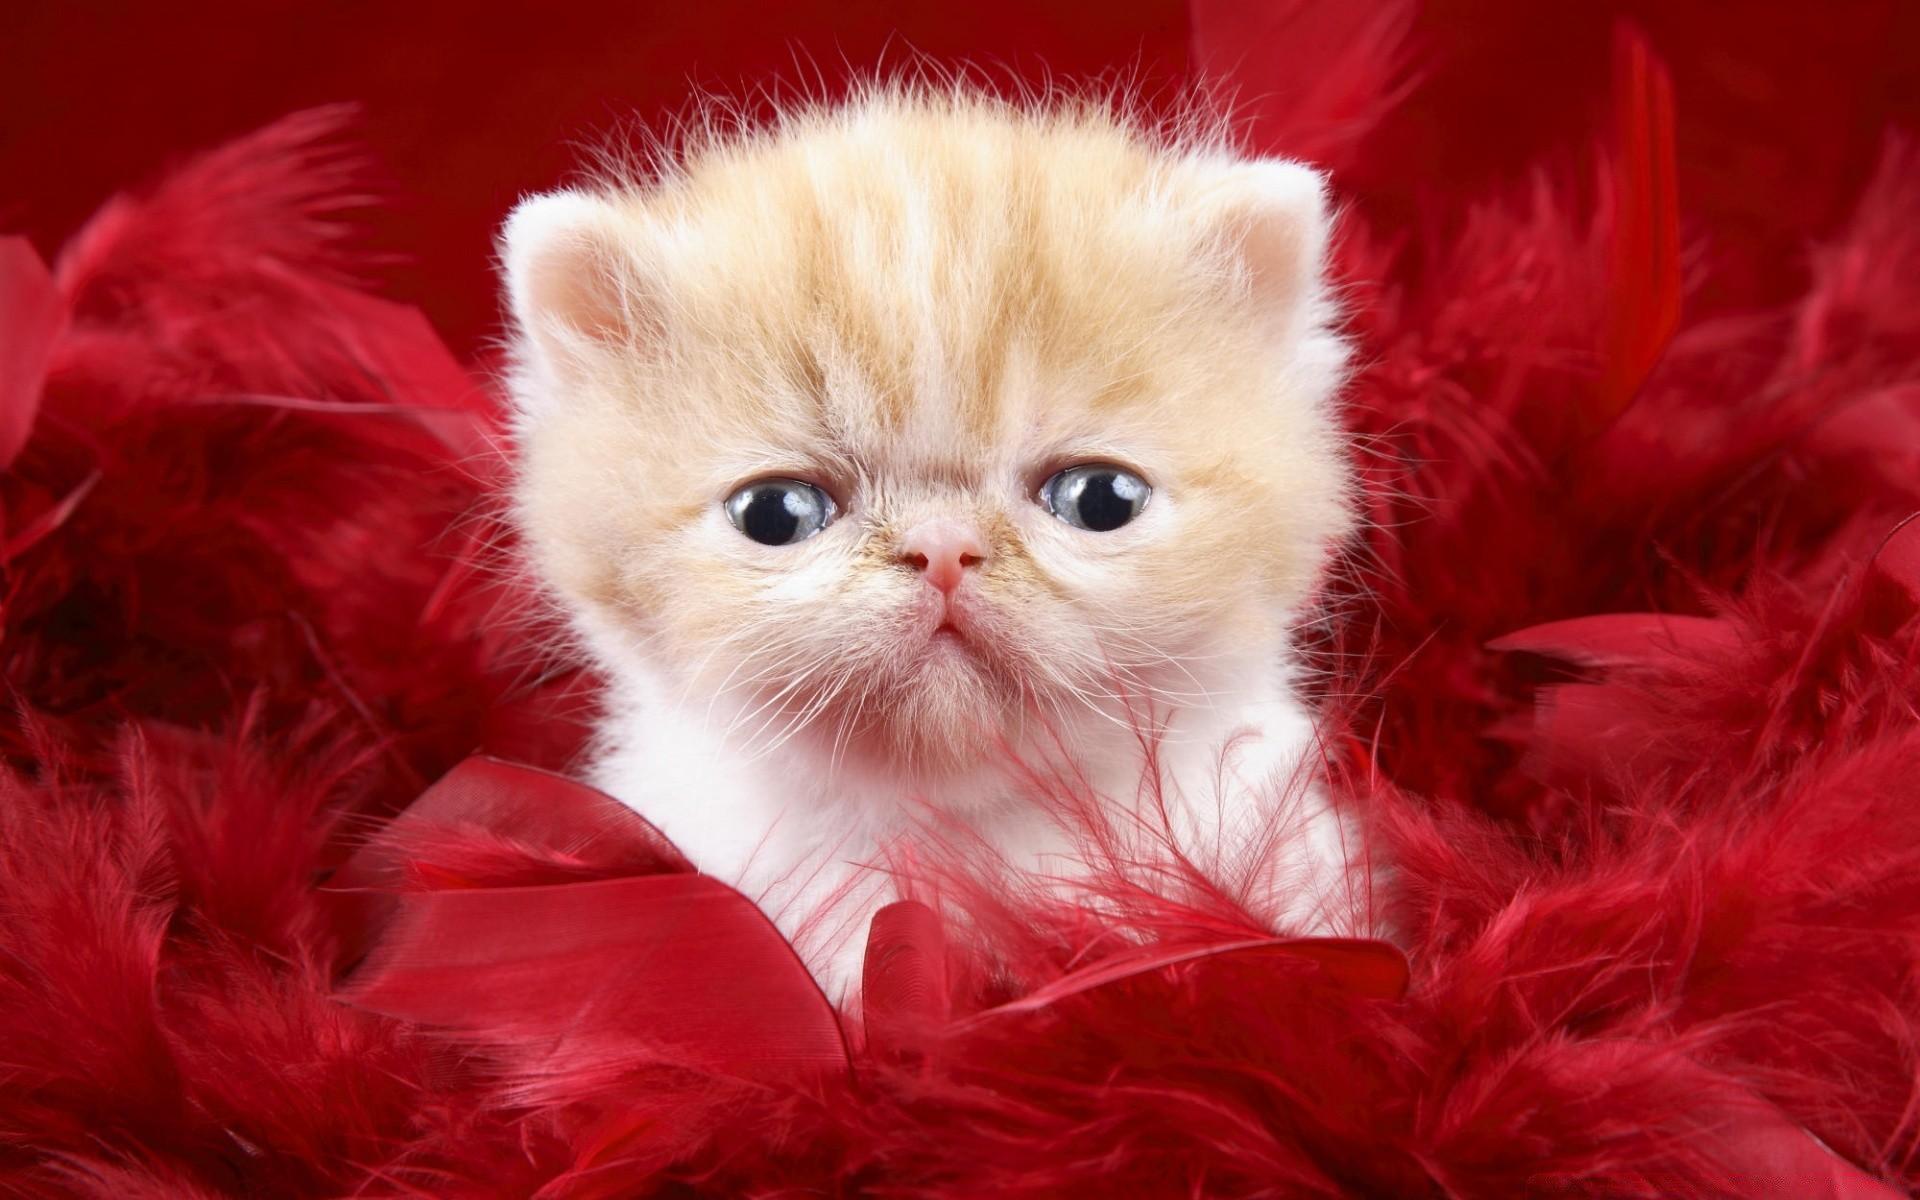 Картинки вопросами, кошки и котята картинки красивые